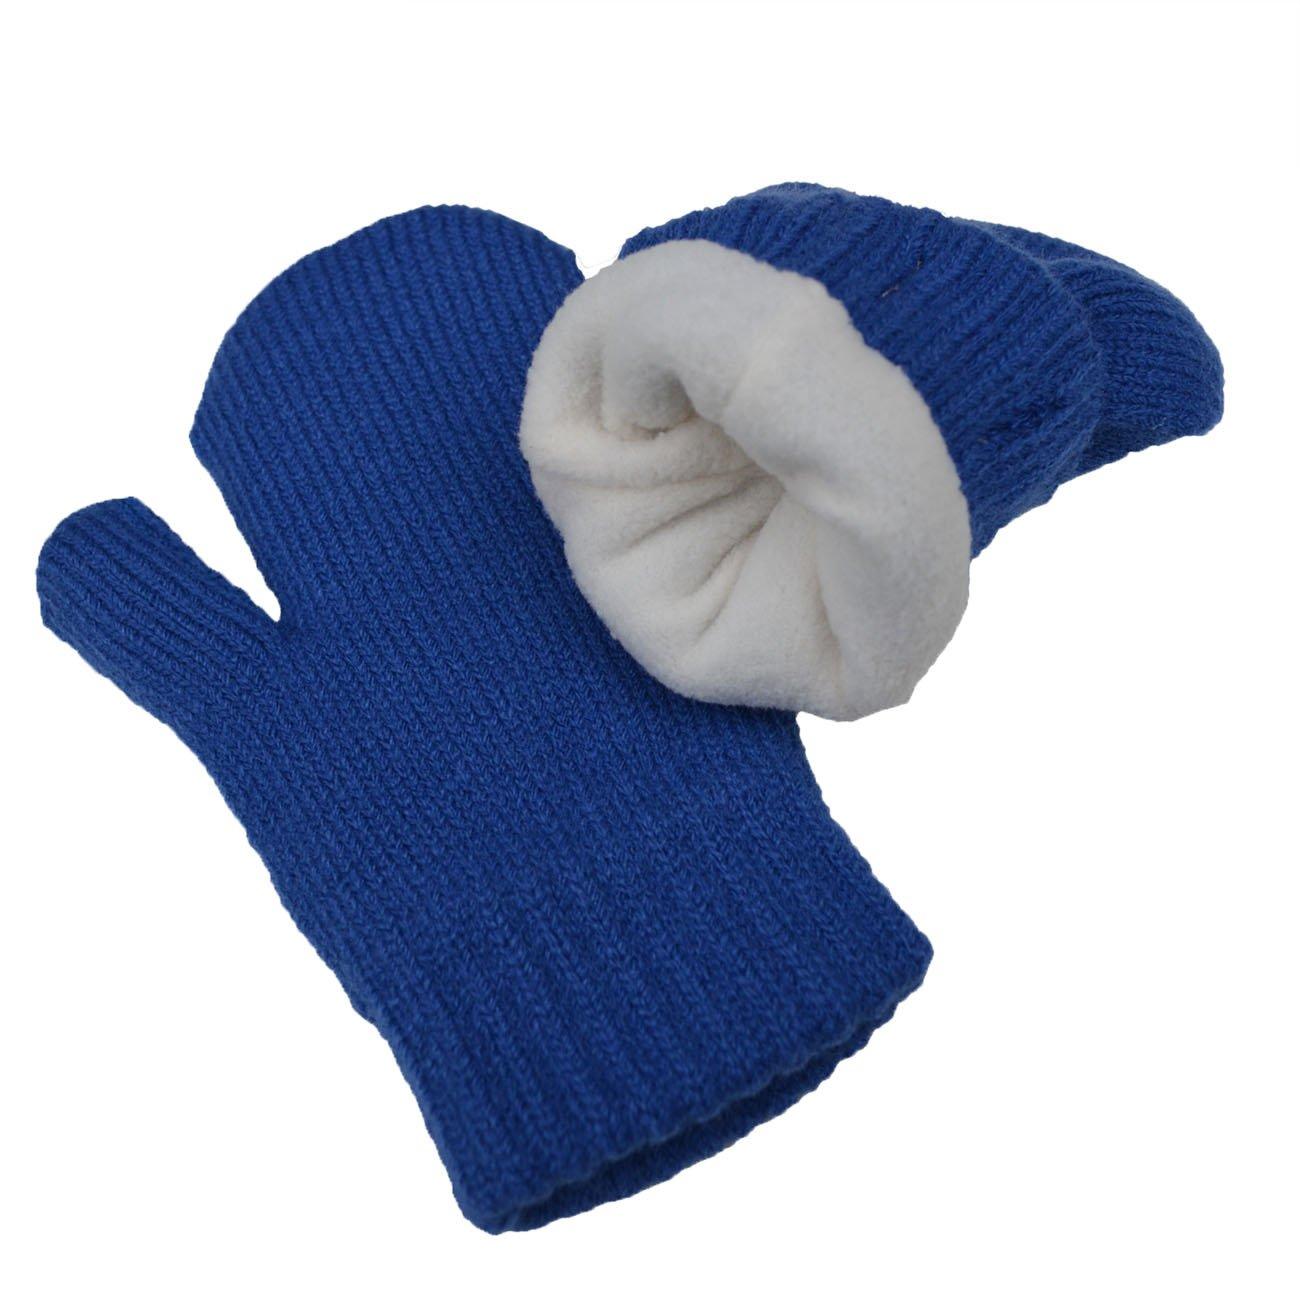 Jan /& Jul Warm Toddler Kids Adult Fall Winter Beanie Matching Twinning Hats